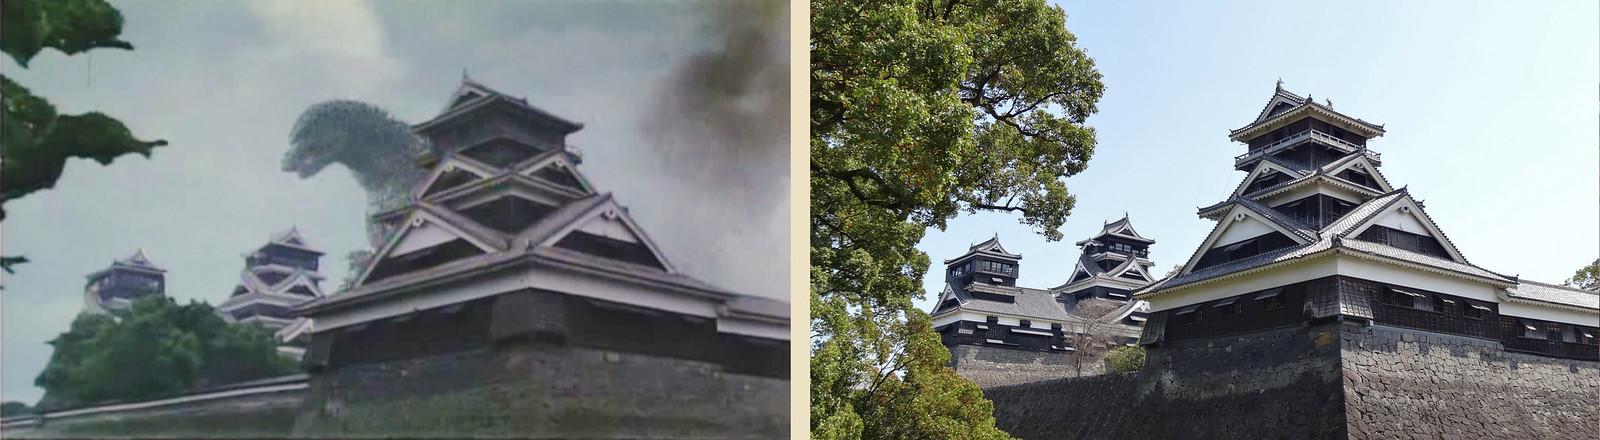 Godzilla vs SpaceGodzilla Kumamoto Location